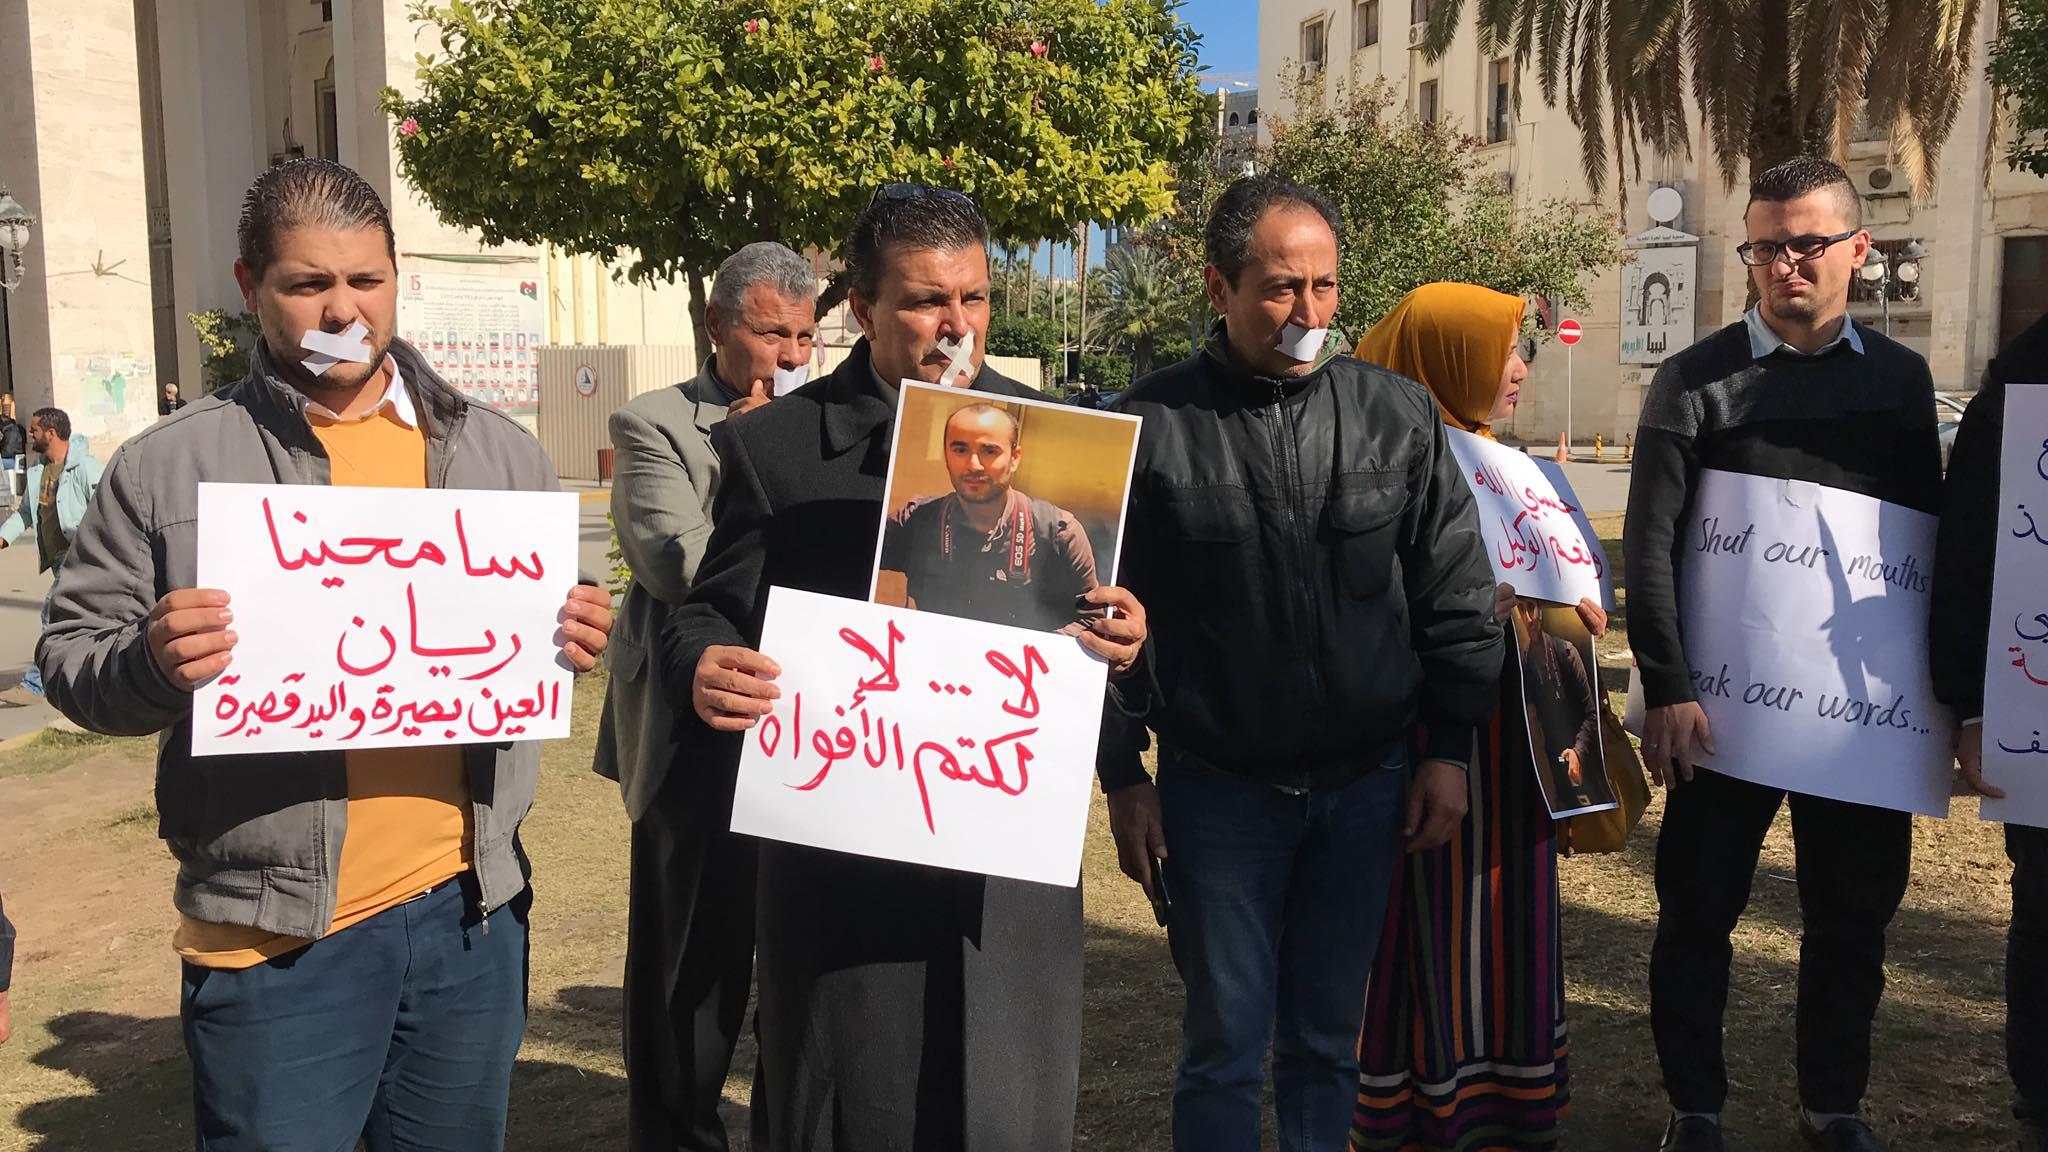 صحفيو ليبيا ينتفضون ضد استهدافهم